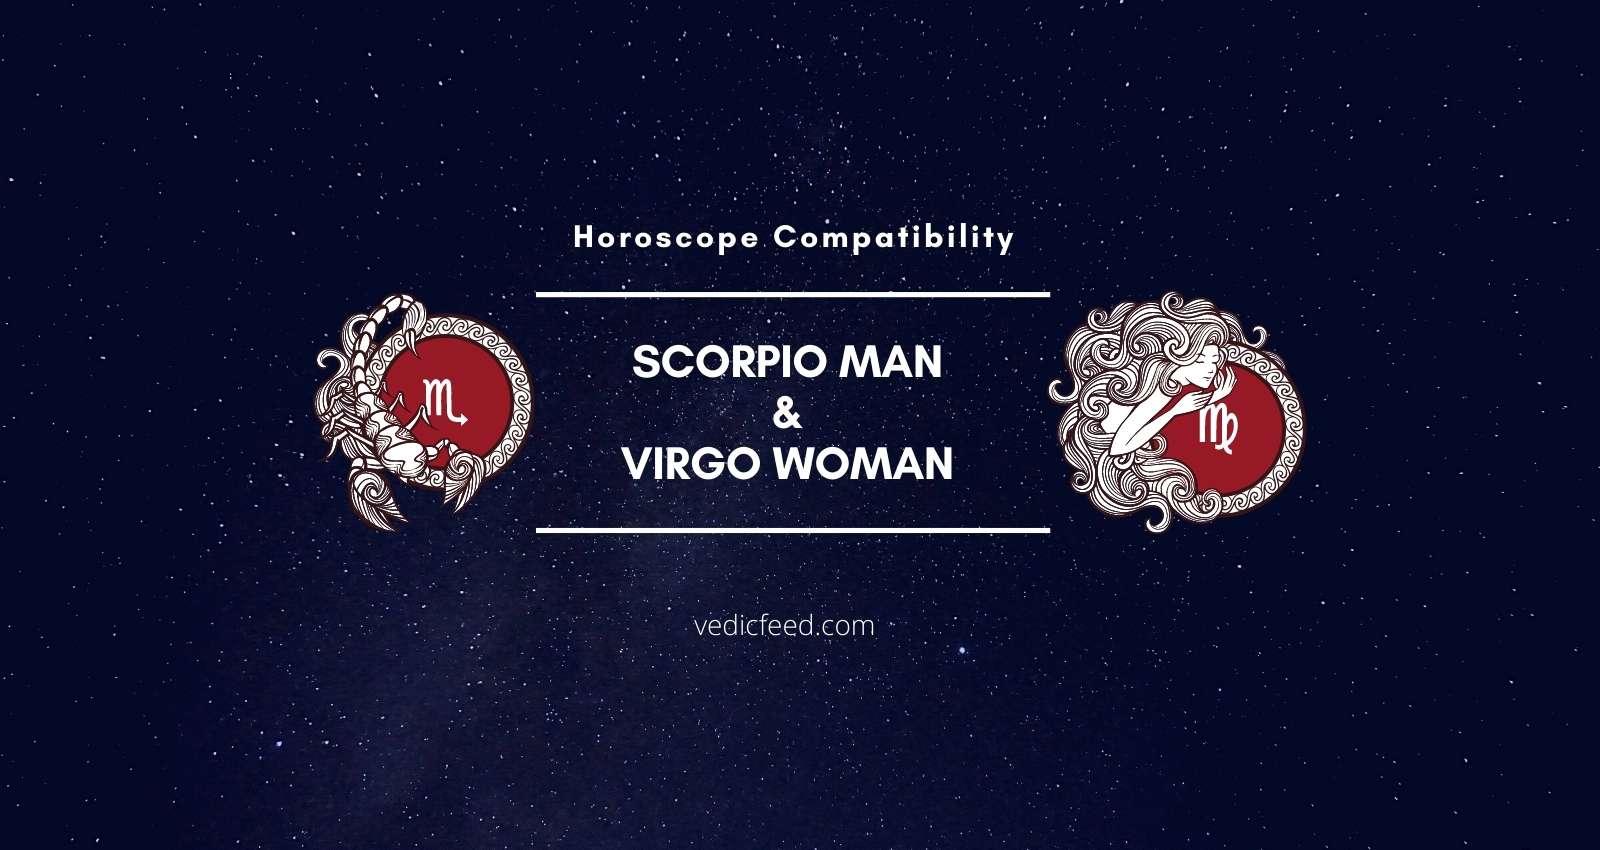 Scorpio Man and Virgo Woman Compatibility